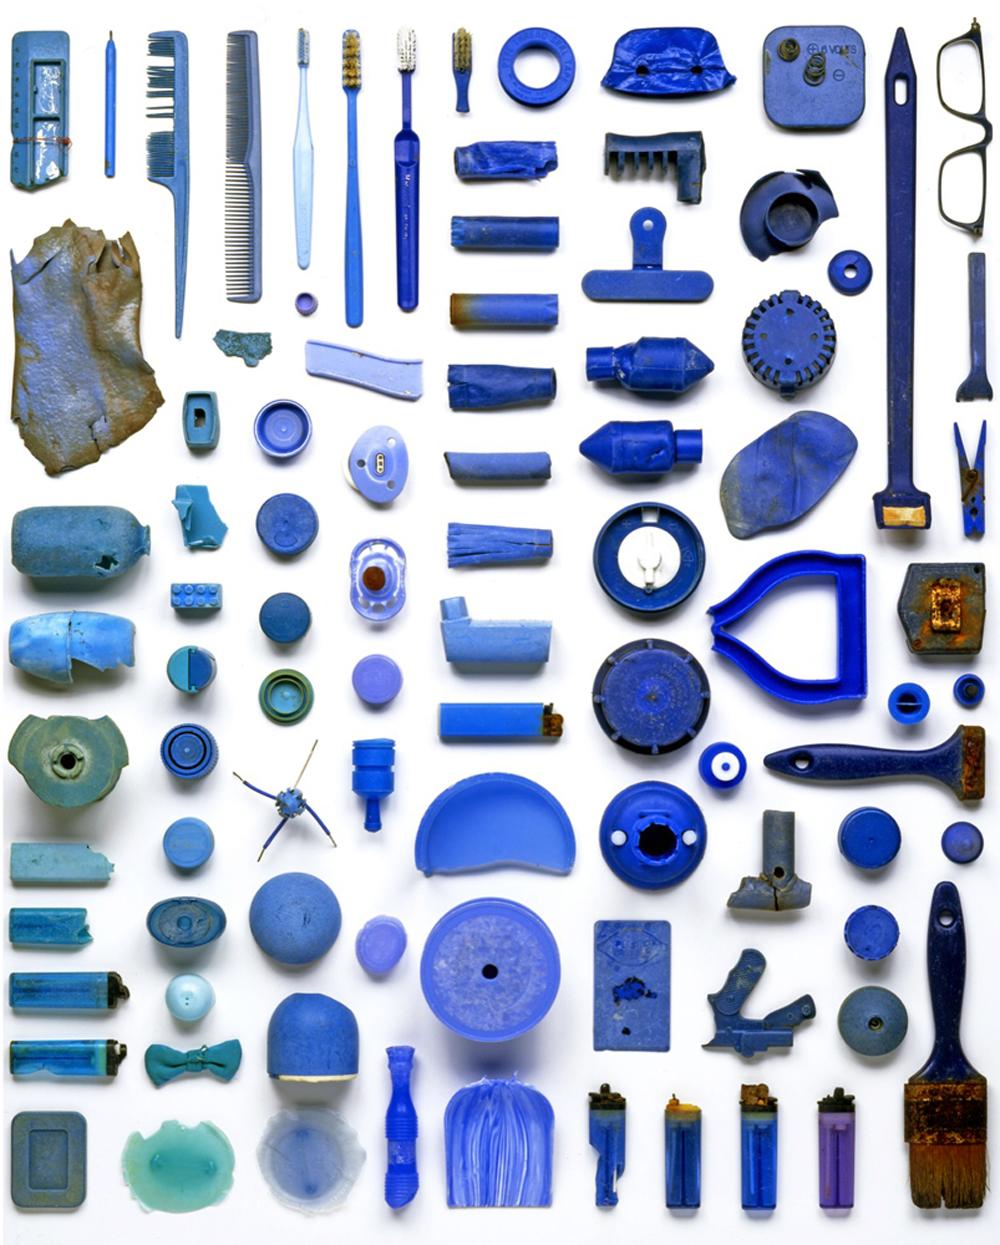 dung-blue-landscape